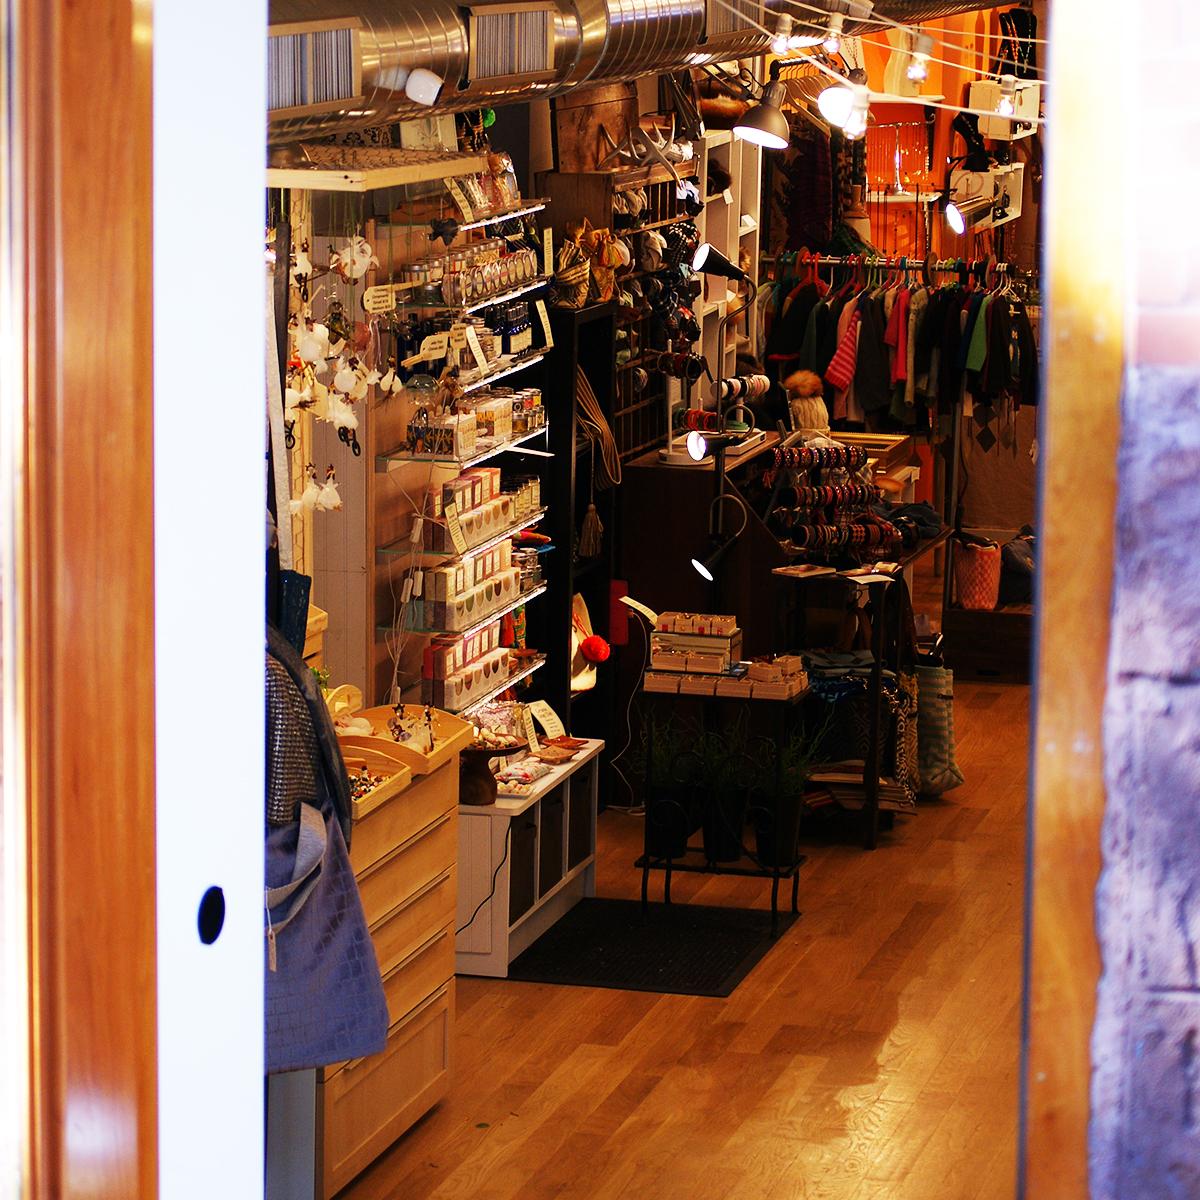 A look inside of the Newbury Handmade Market.